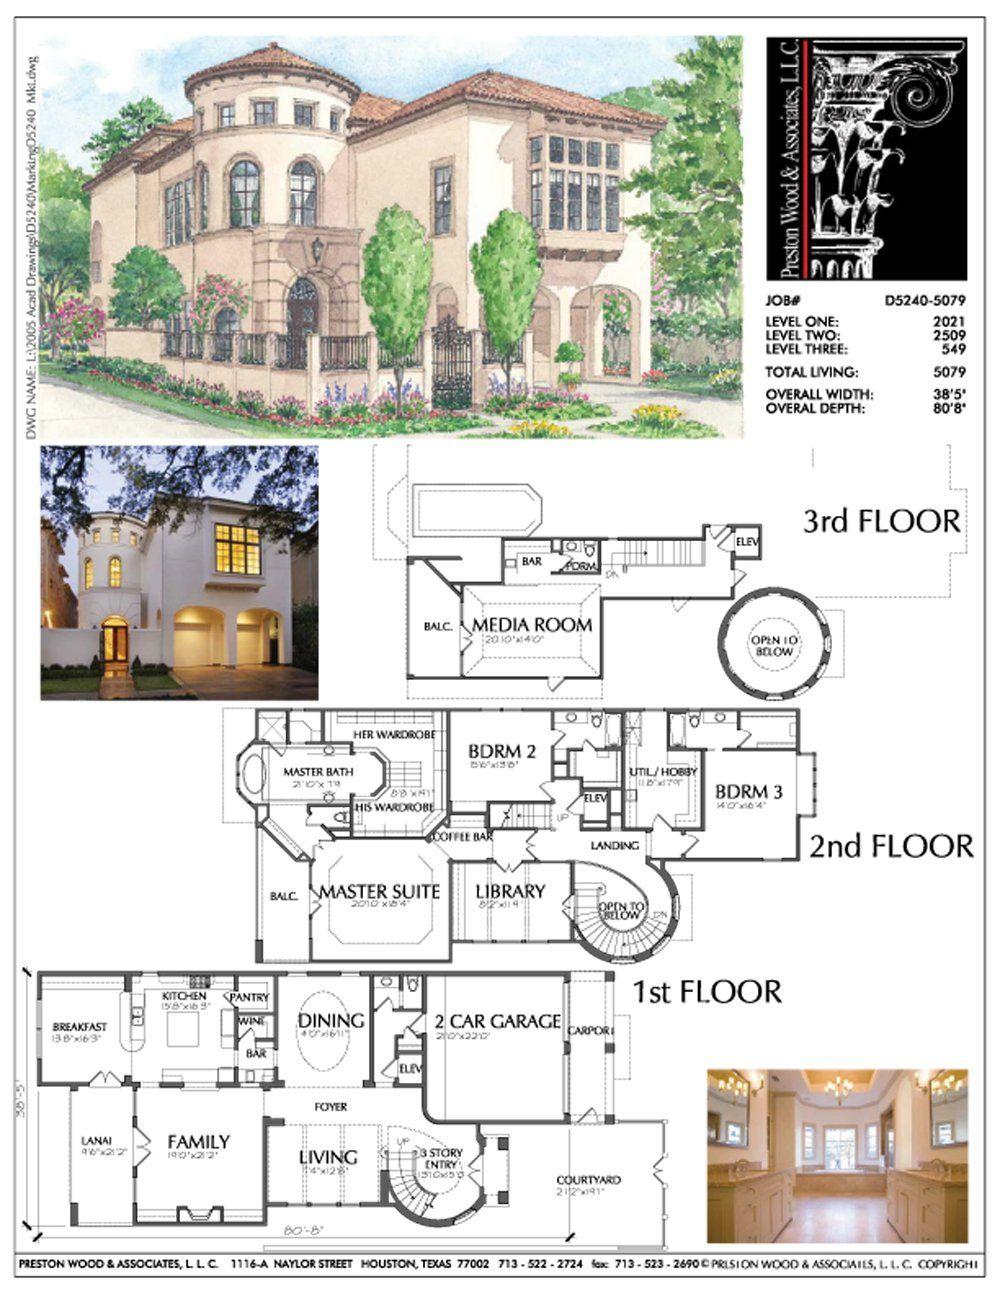 Three Story Urban House Plans Inner City House Plans Tnd Development Preston Wood Associates Dream House Plans City House Luxury House Plans